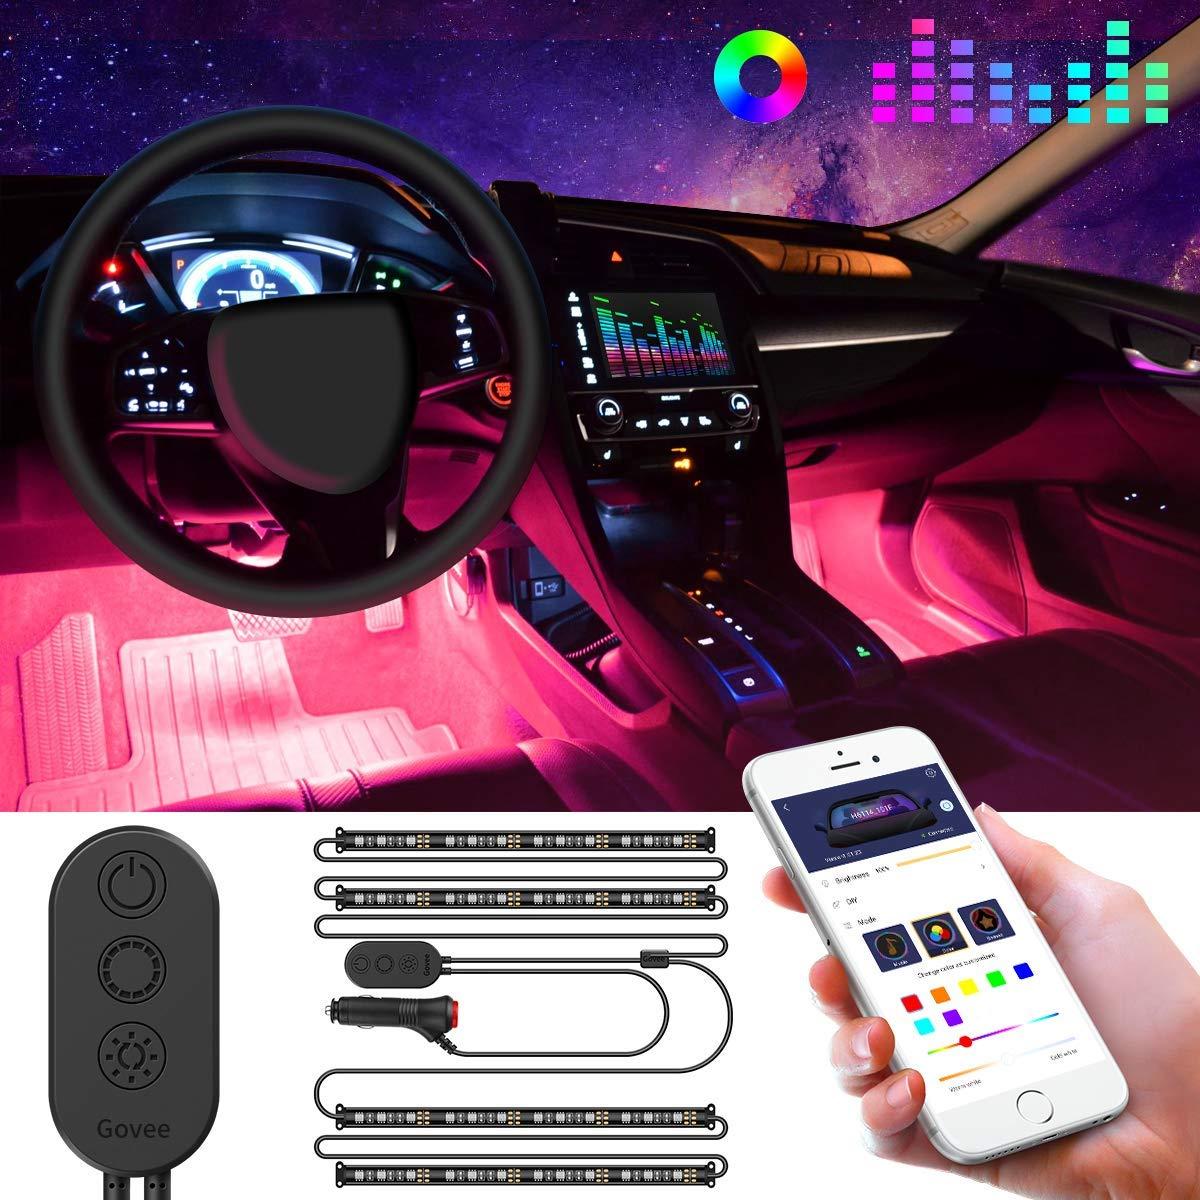 Car Interior Lights Govee Car LED Strip Light Upgraded Two-Line Design Waterproof 4pcs 48 LED APP Controlled Lighting Kits Multi DIY Colour Music Under Dash Car Lighting with Car Charger DC 12V